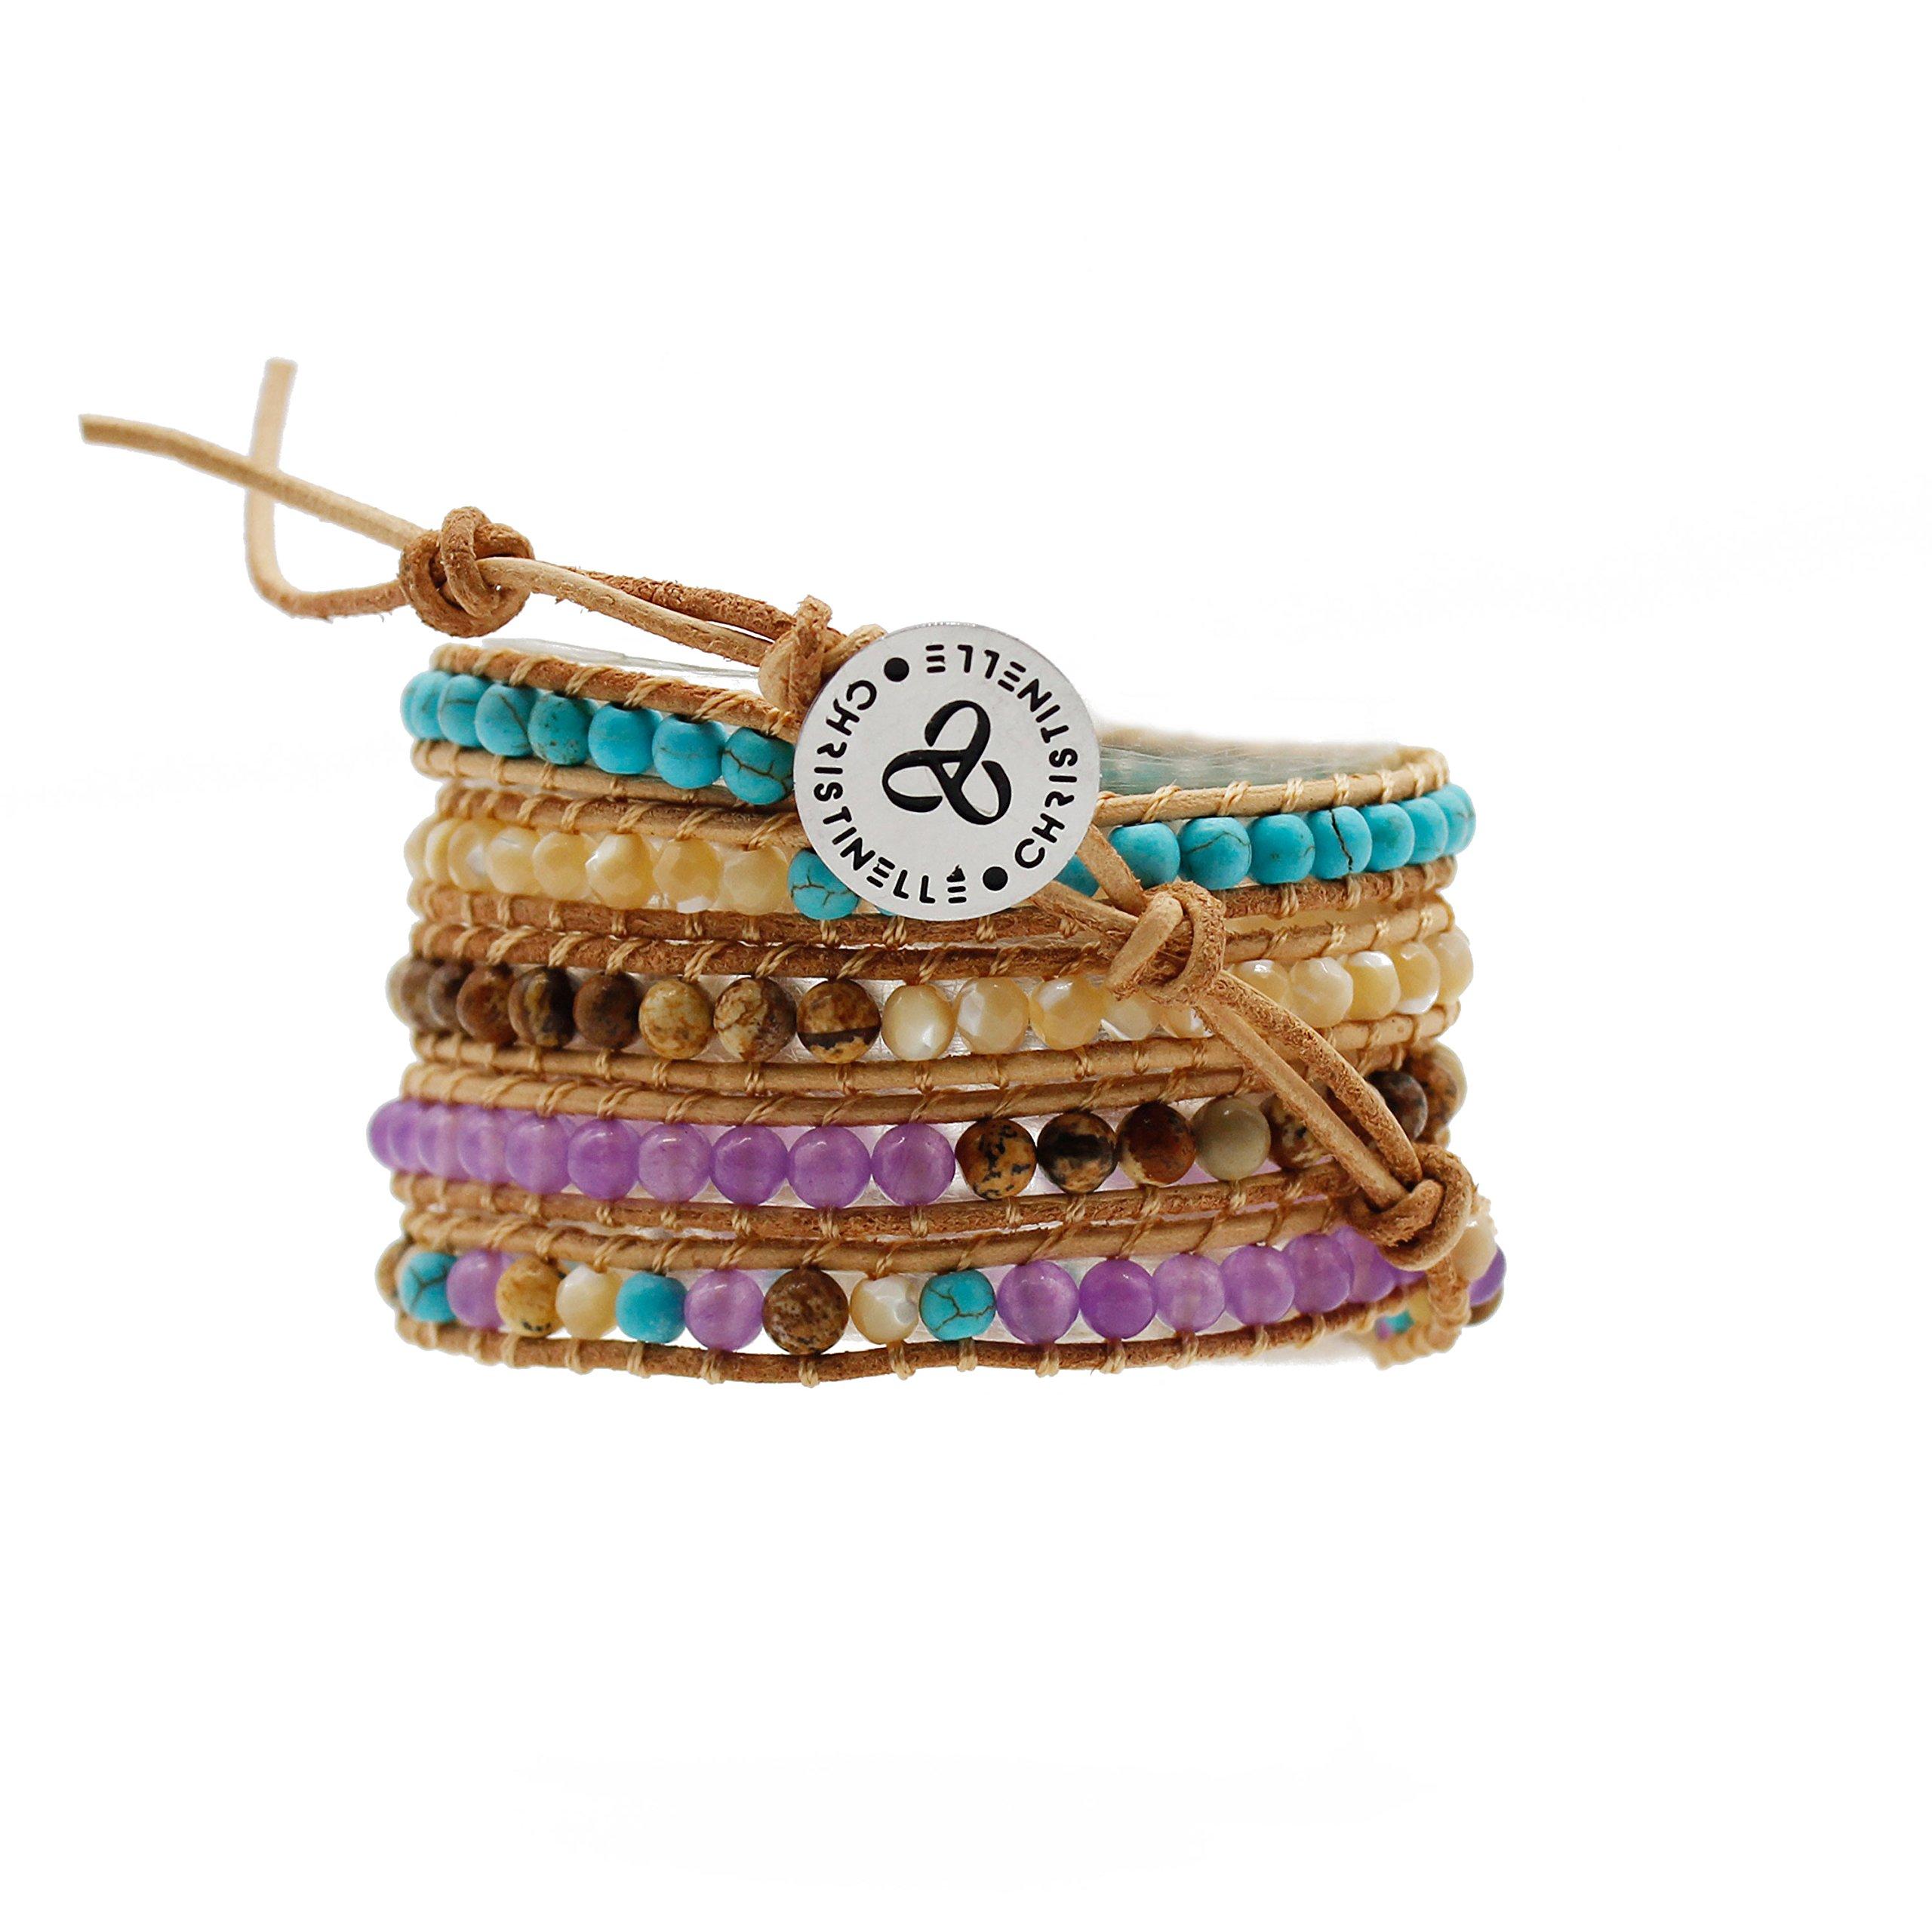 Christinelle Leather Wrap Bracelet, Beaded Bracelets for Women, Five Rows Purple, Blue, Tan, Brown, Cream Beads, 36''